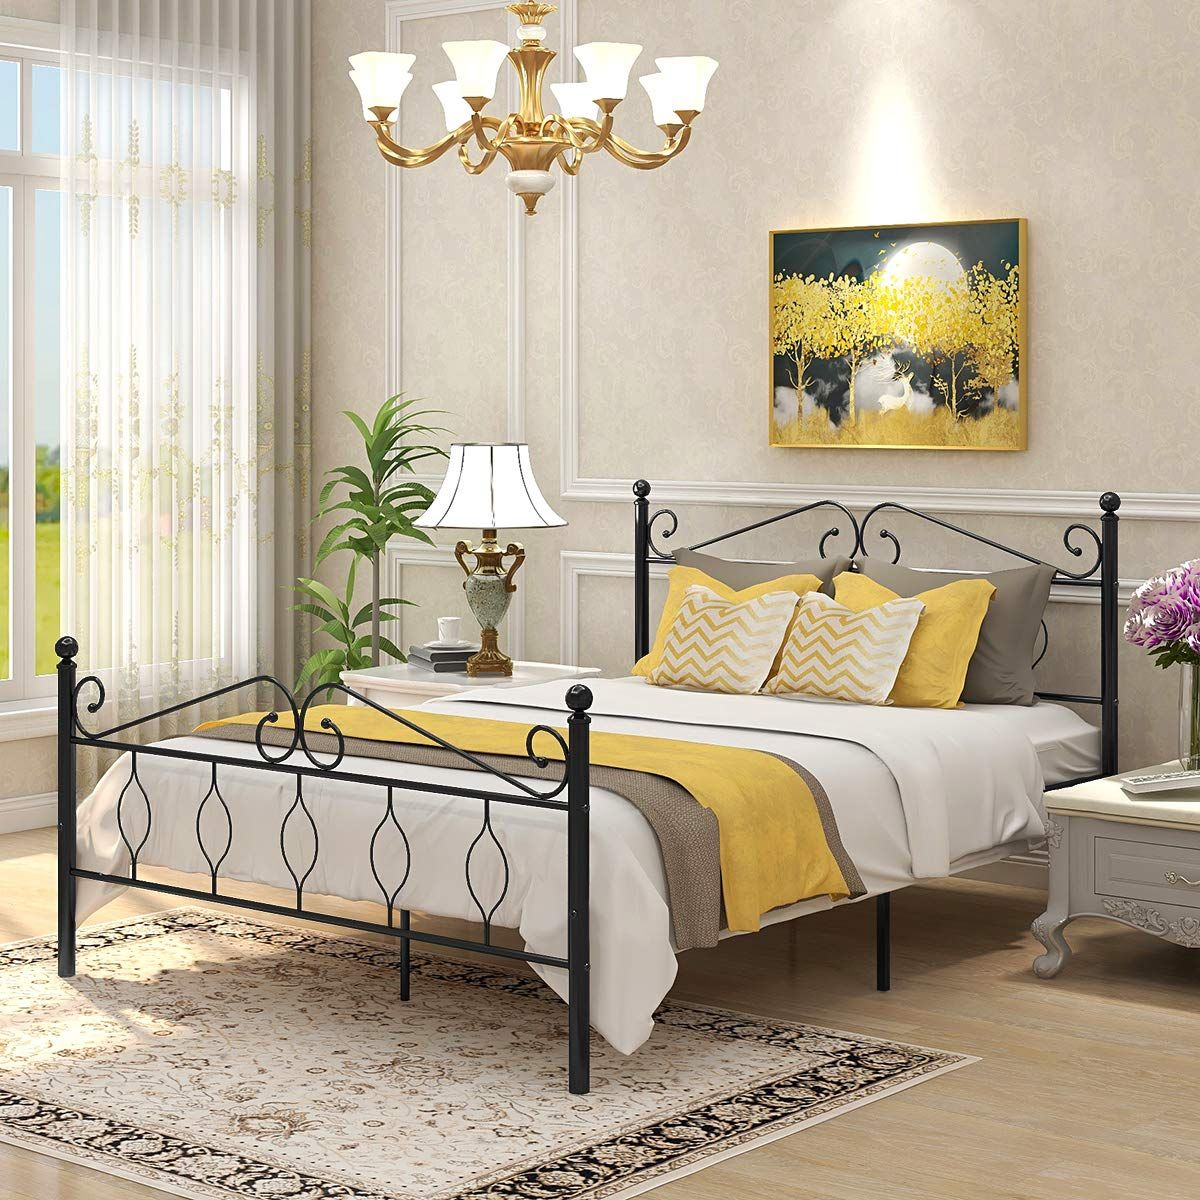 Queen Size Bed Frame Victorian Vintage Style Platform